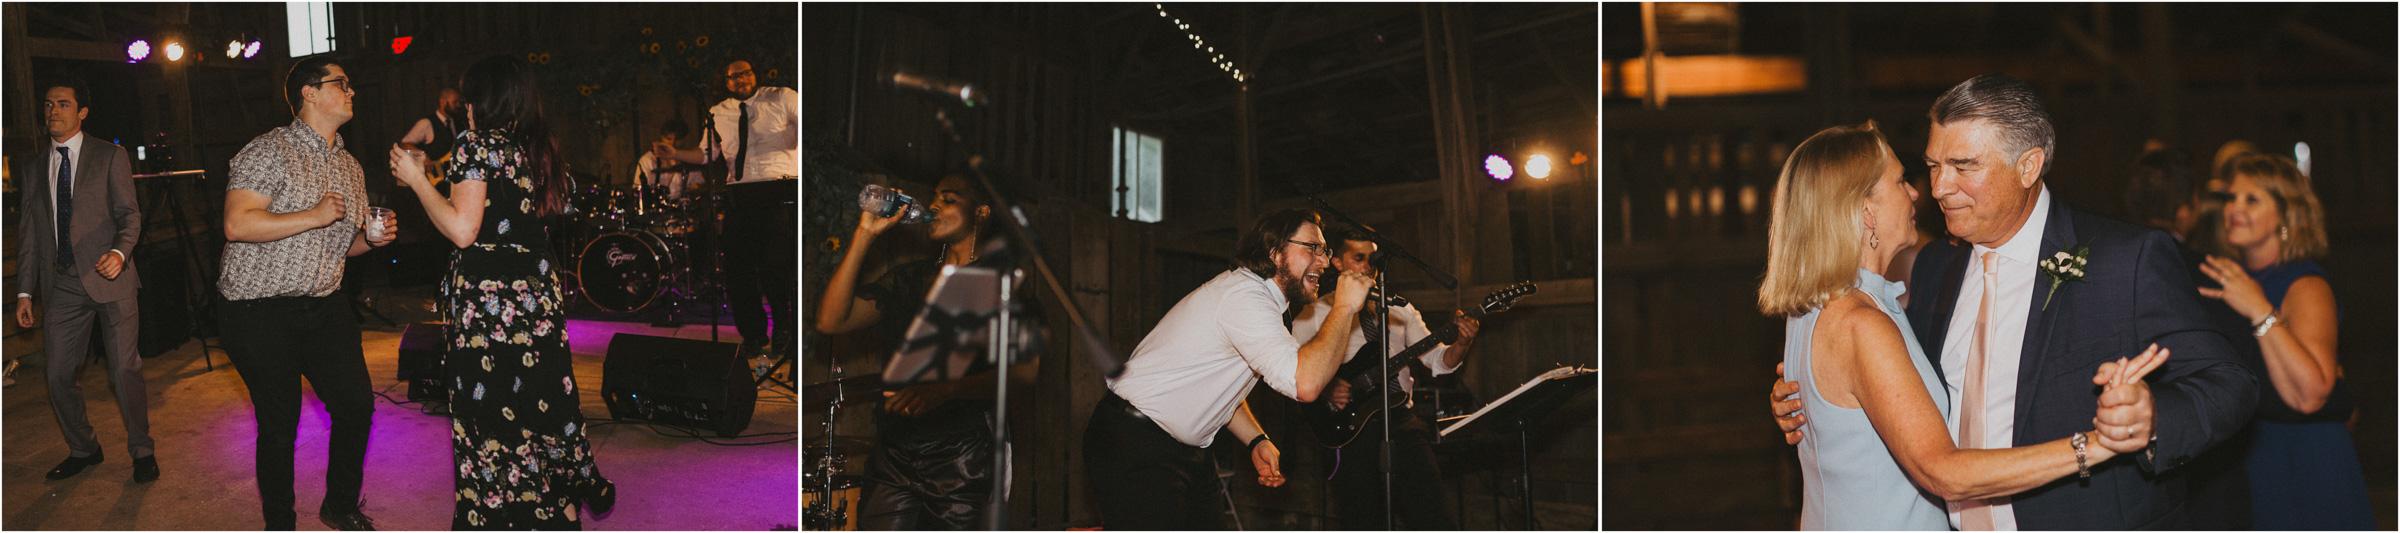 alyssa barletter photography nelson wedding nebraska city lied lodge morton barn spring wedding photographer-64.jpg